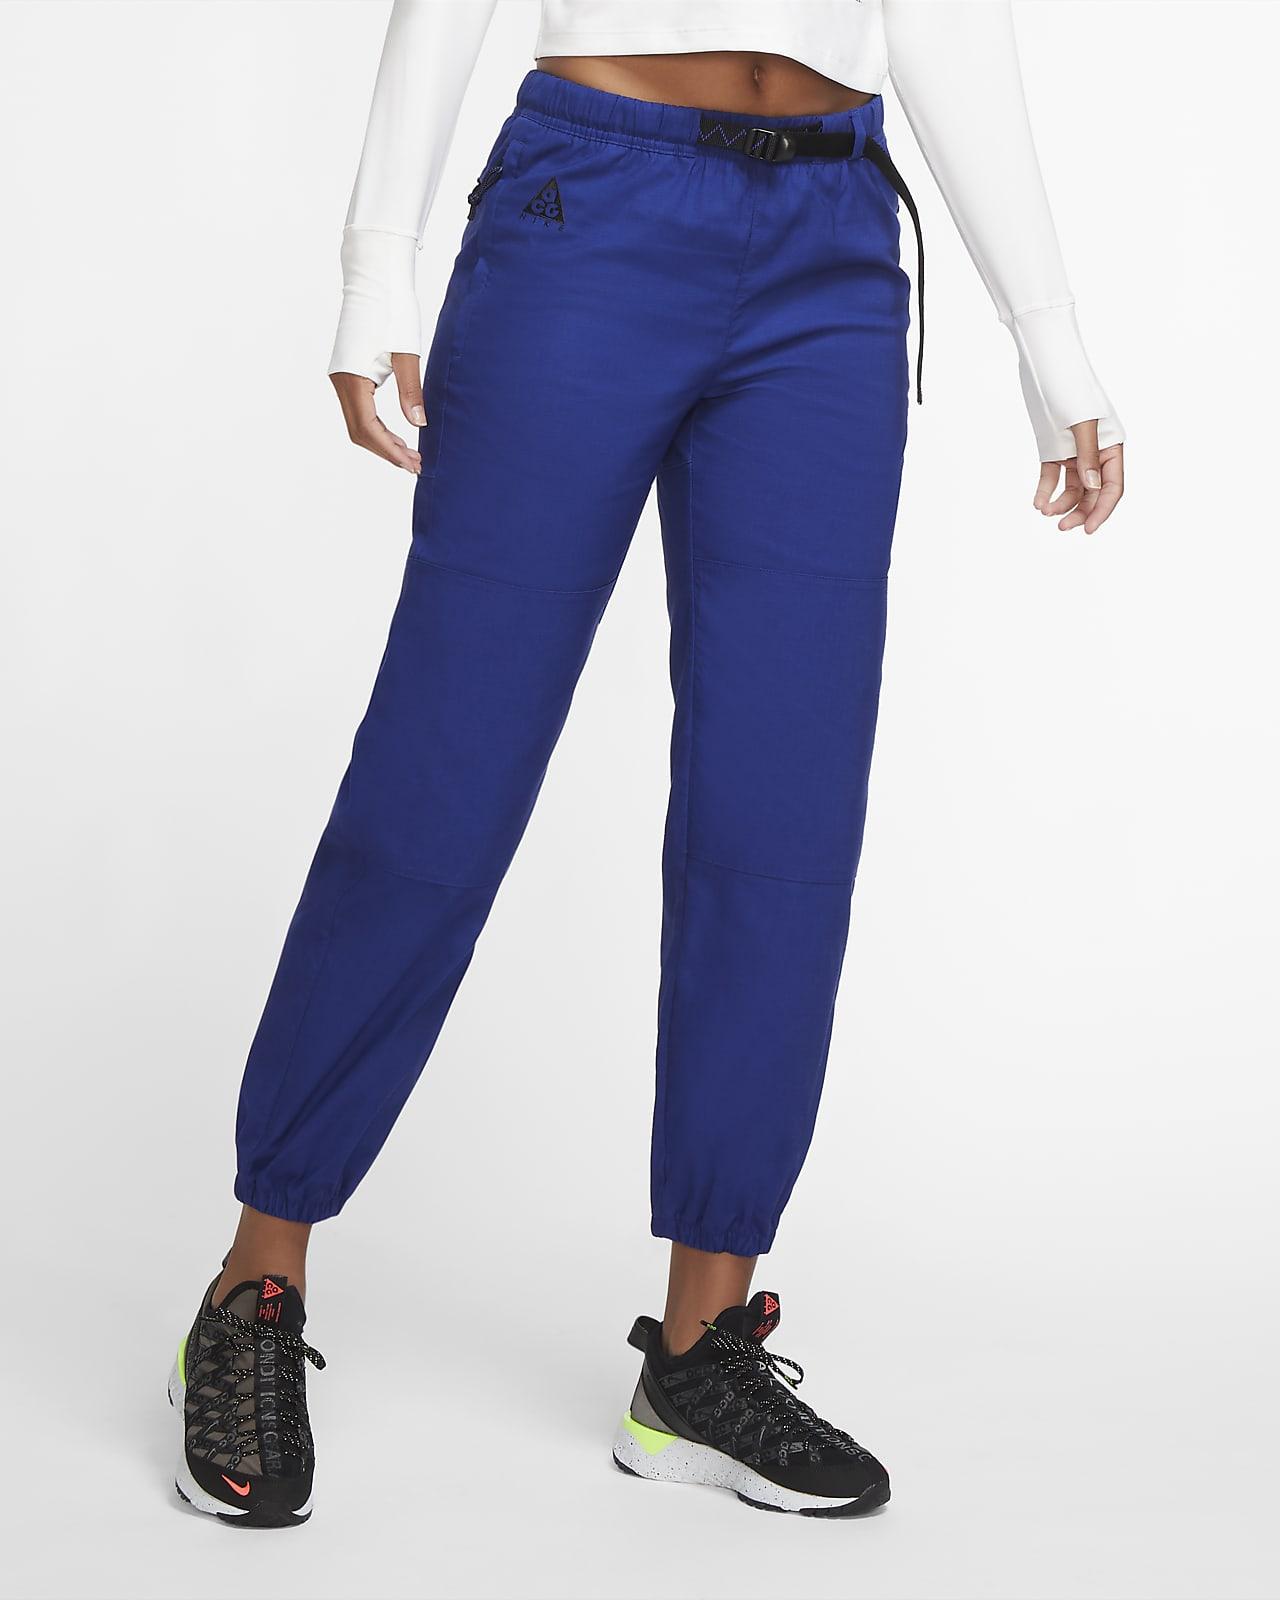 Nike ACG 女子梭织长裤